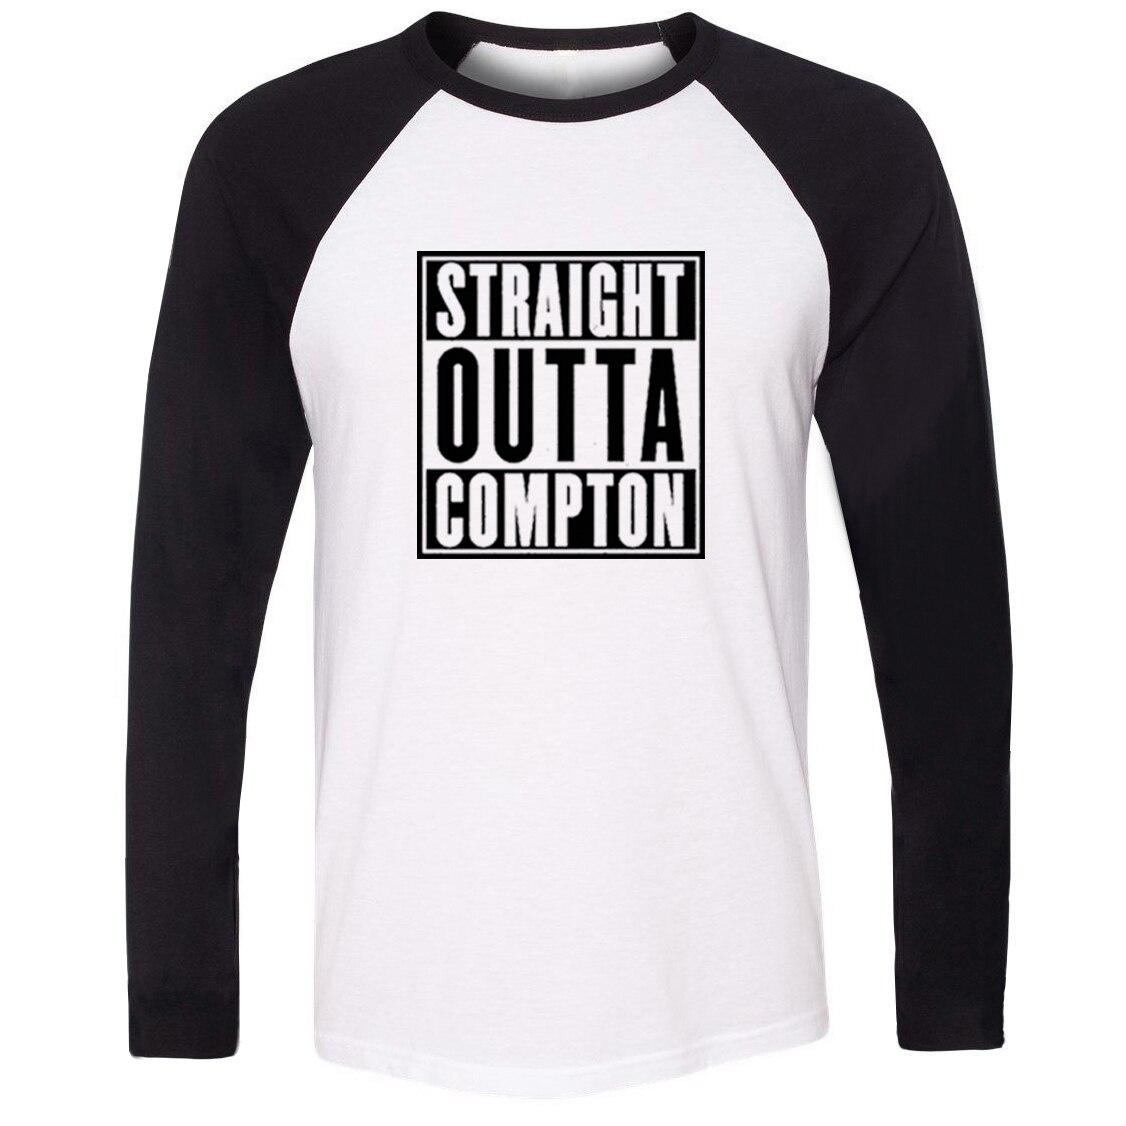 Little Boys T-Shirt Ice Cube Short Sleeve Crewneck Cotton Tee Shirt Black